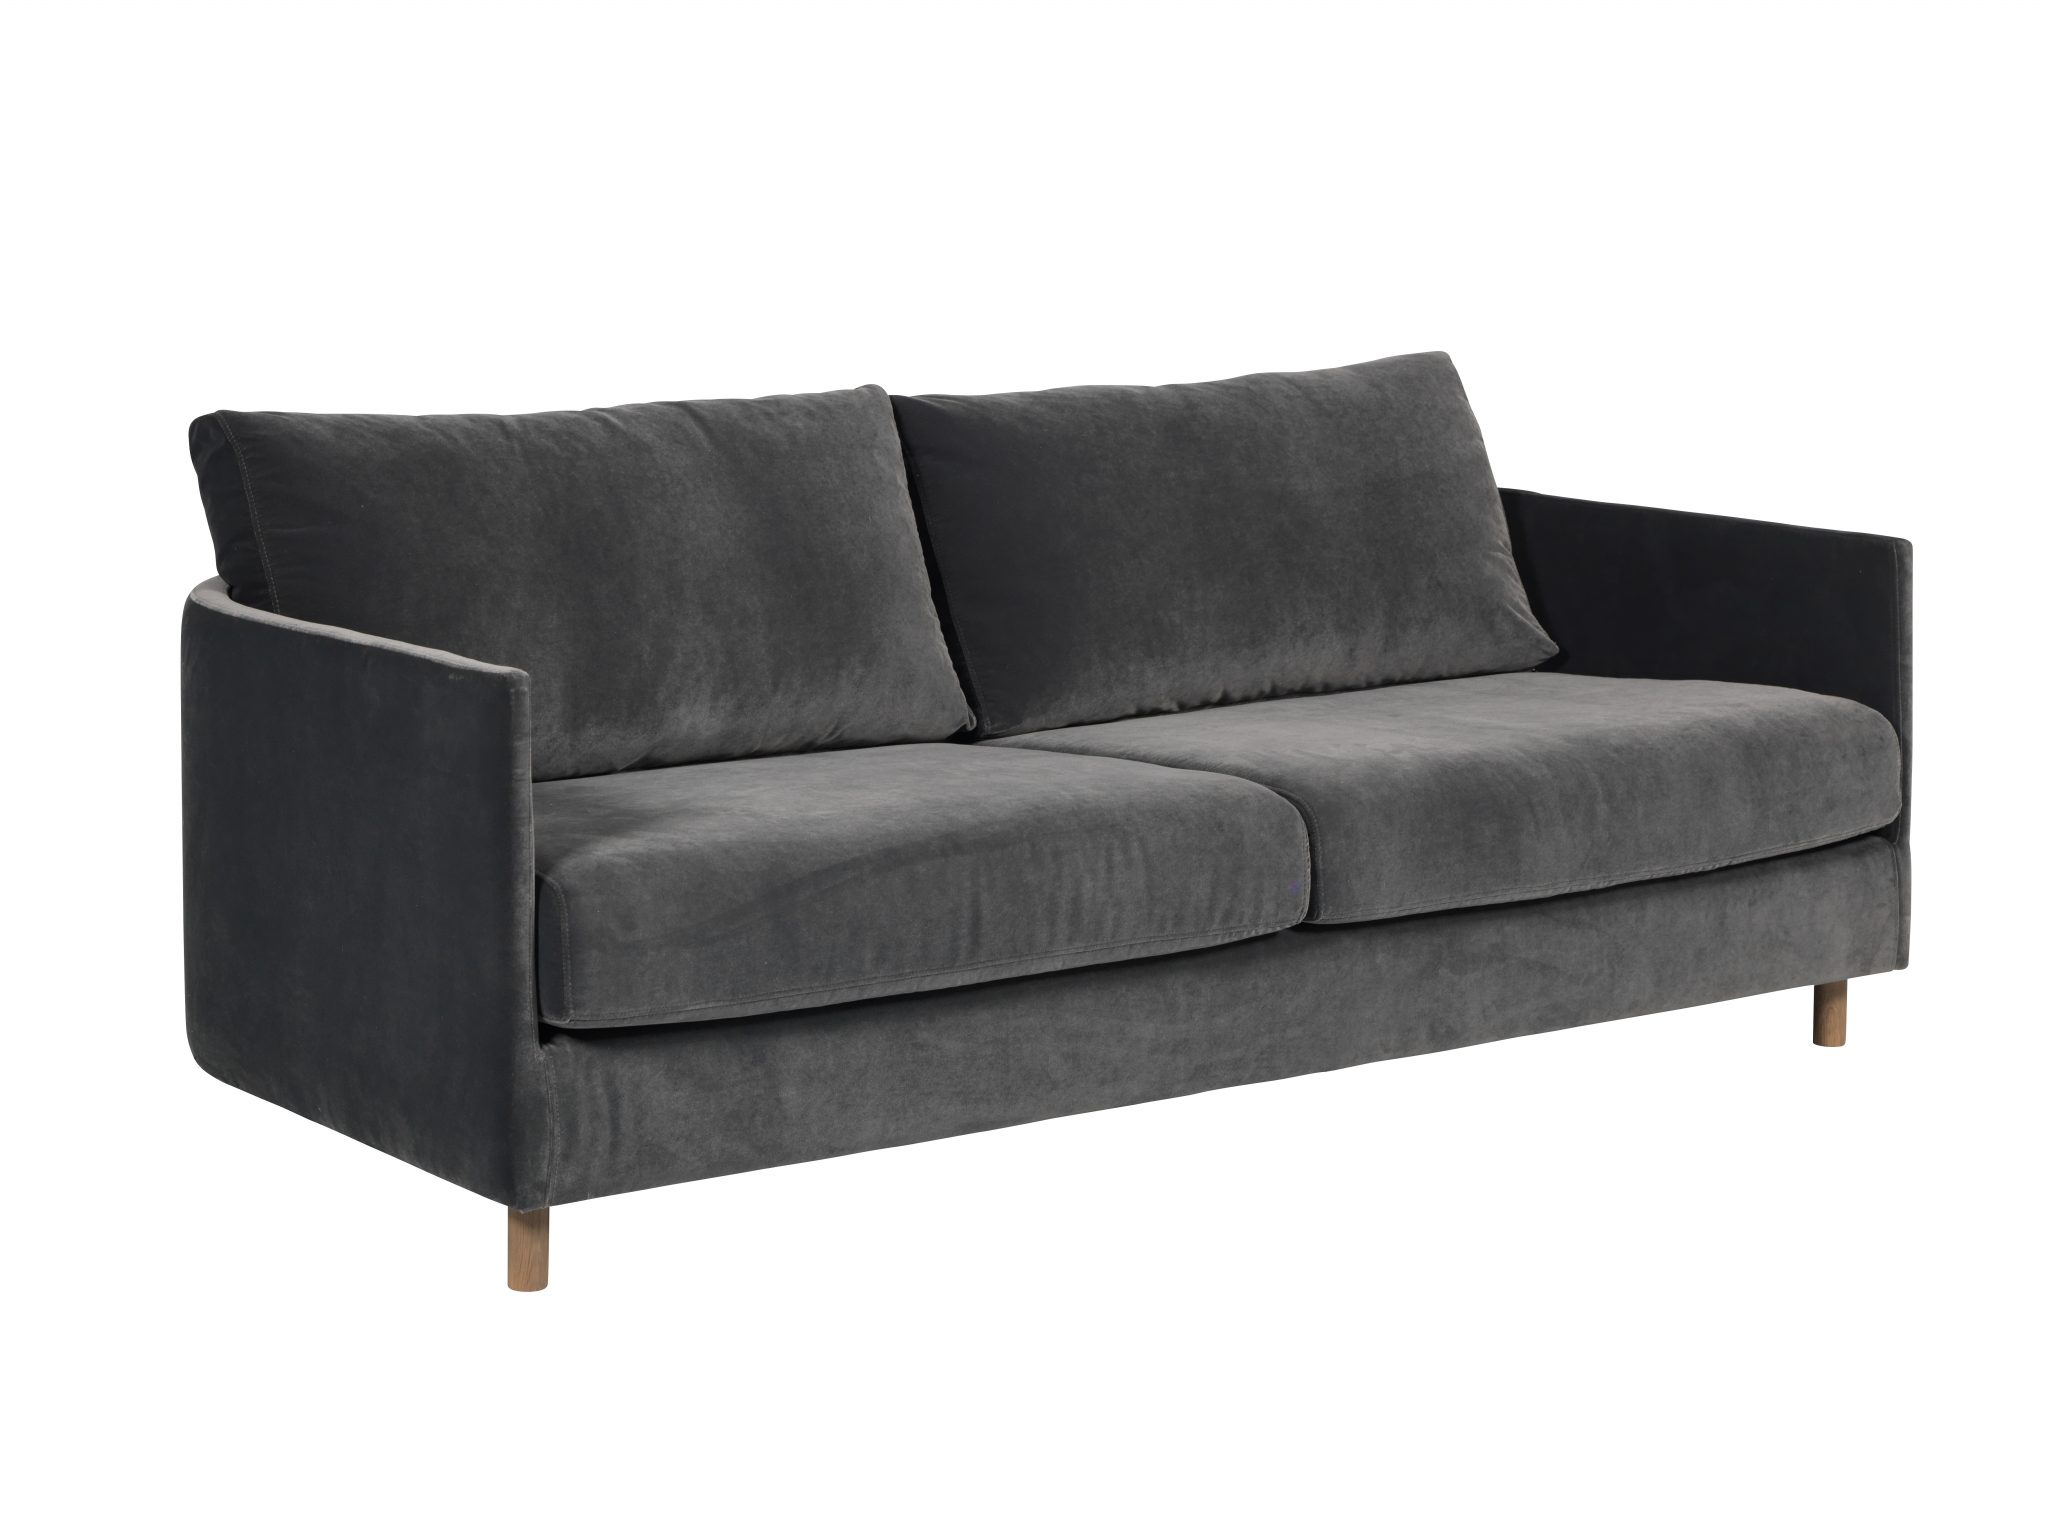 Sofa Harmony Furninova bjarnumbaldai